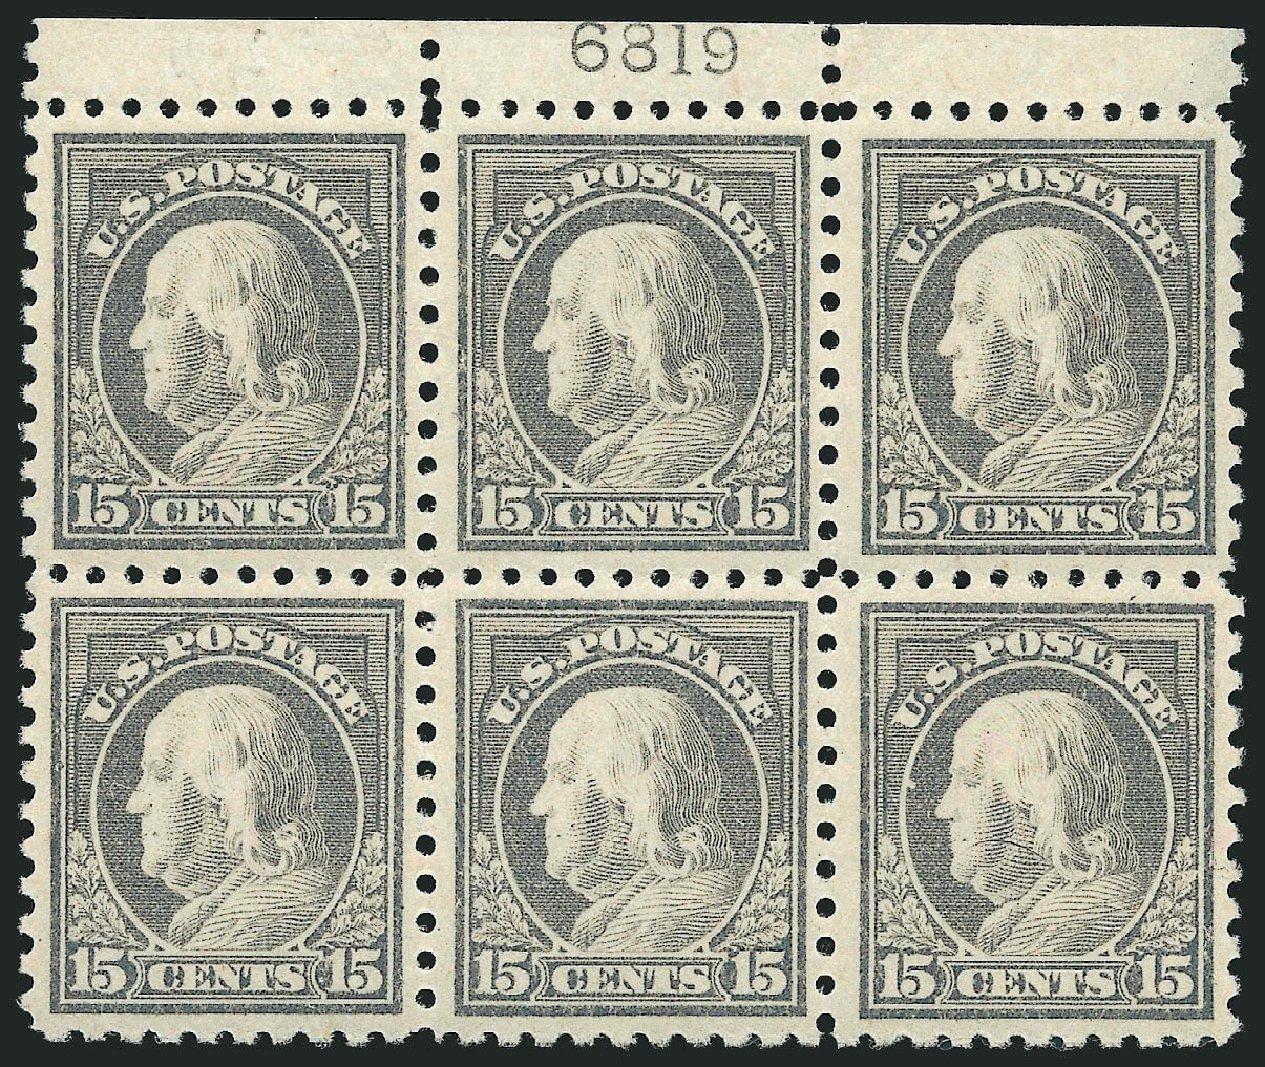 US Stamp Value Scott Cat. 475: 1916 15c Franklin Perf 10. Robert Siegel Auction Galleries, Feb 2015, Sale 1093, Lot 404